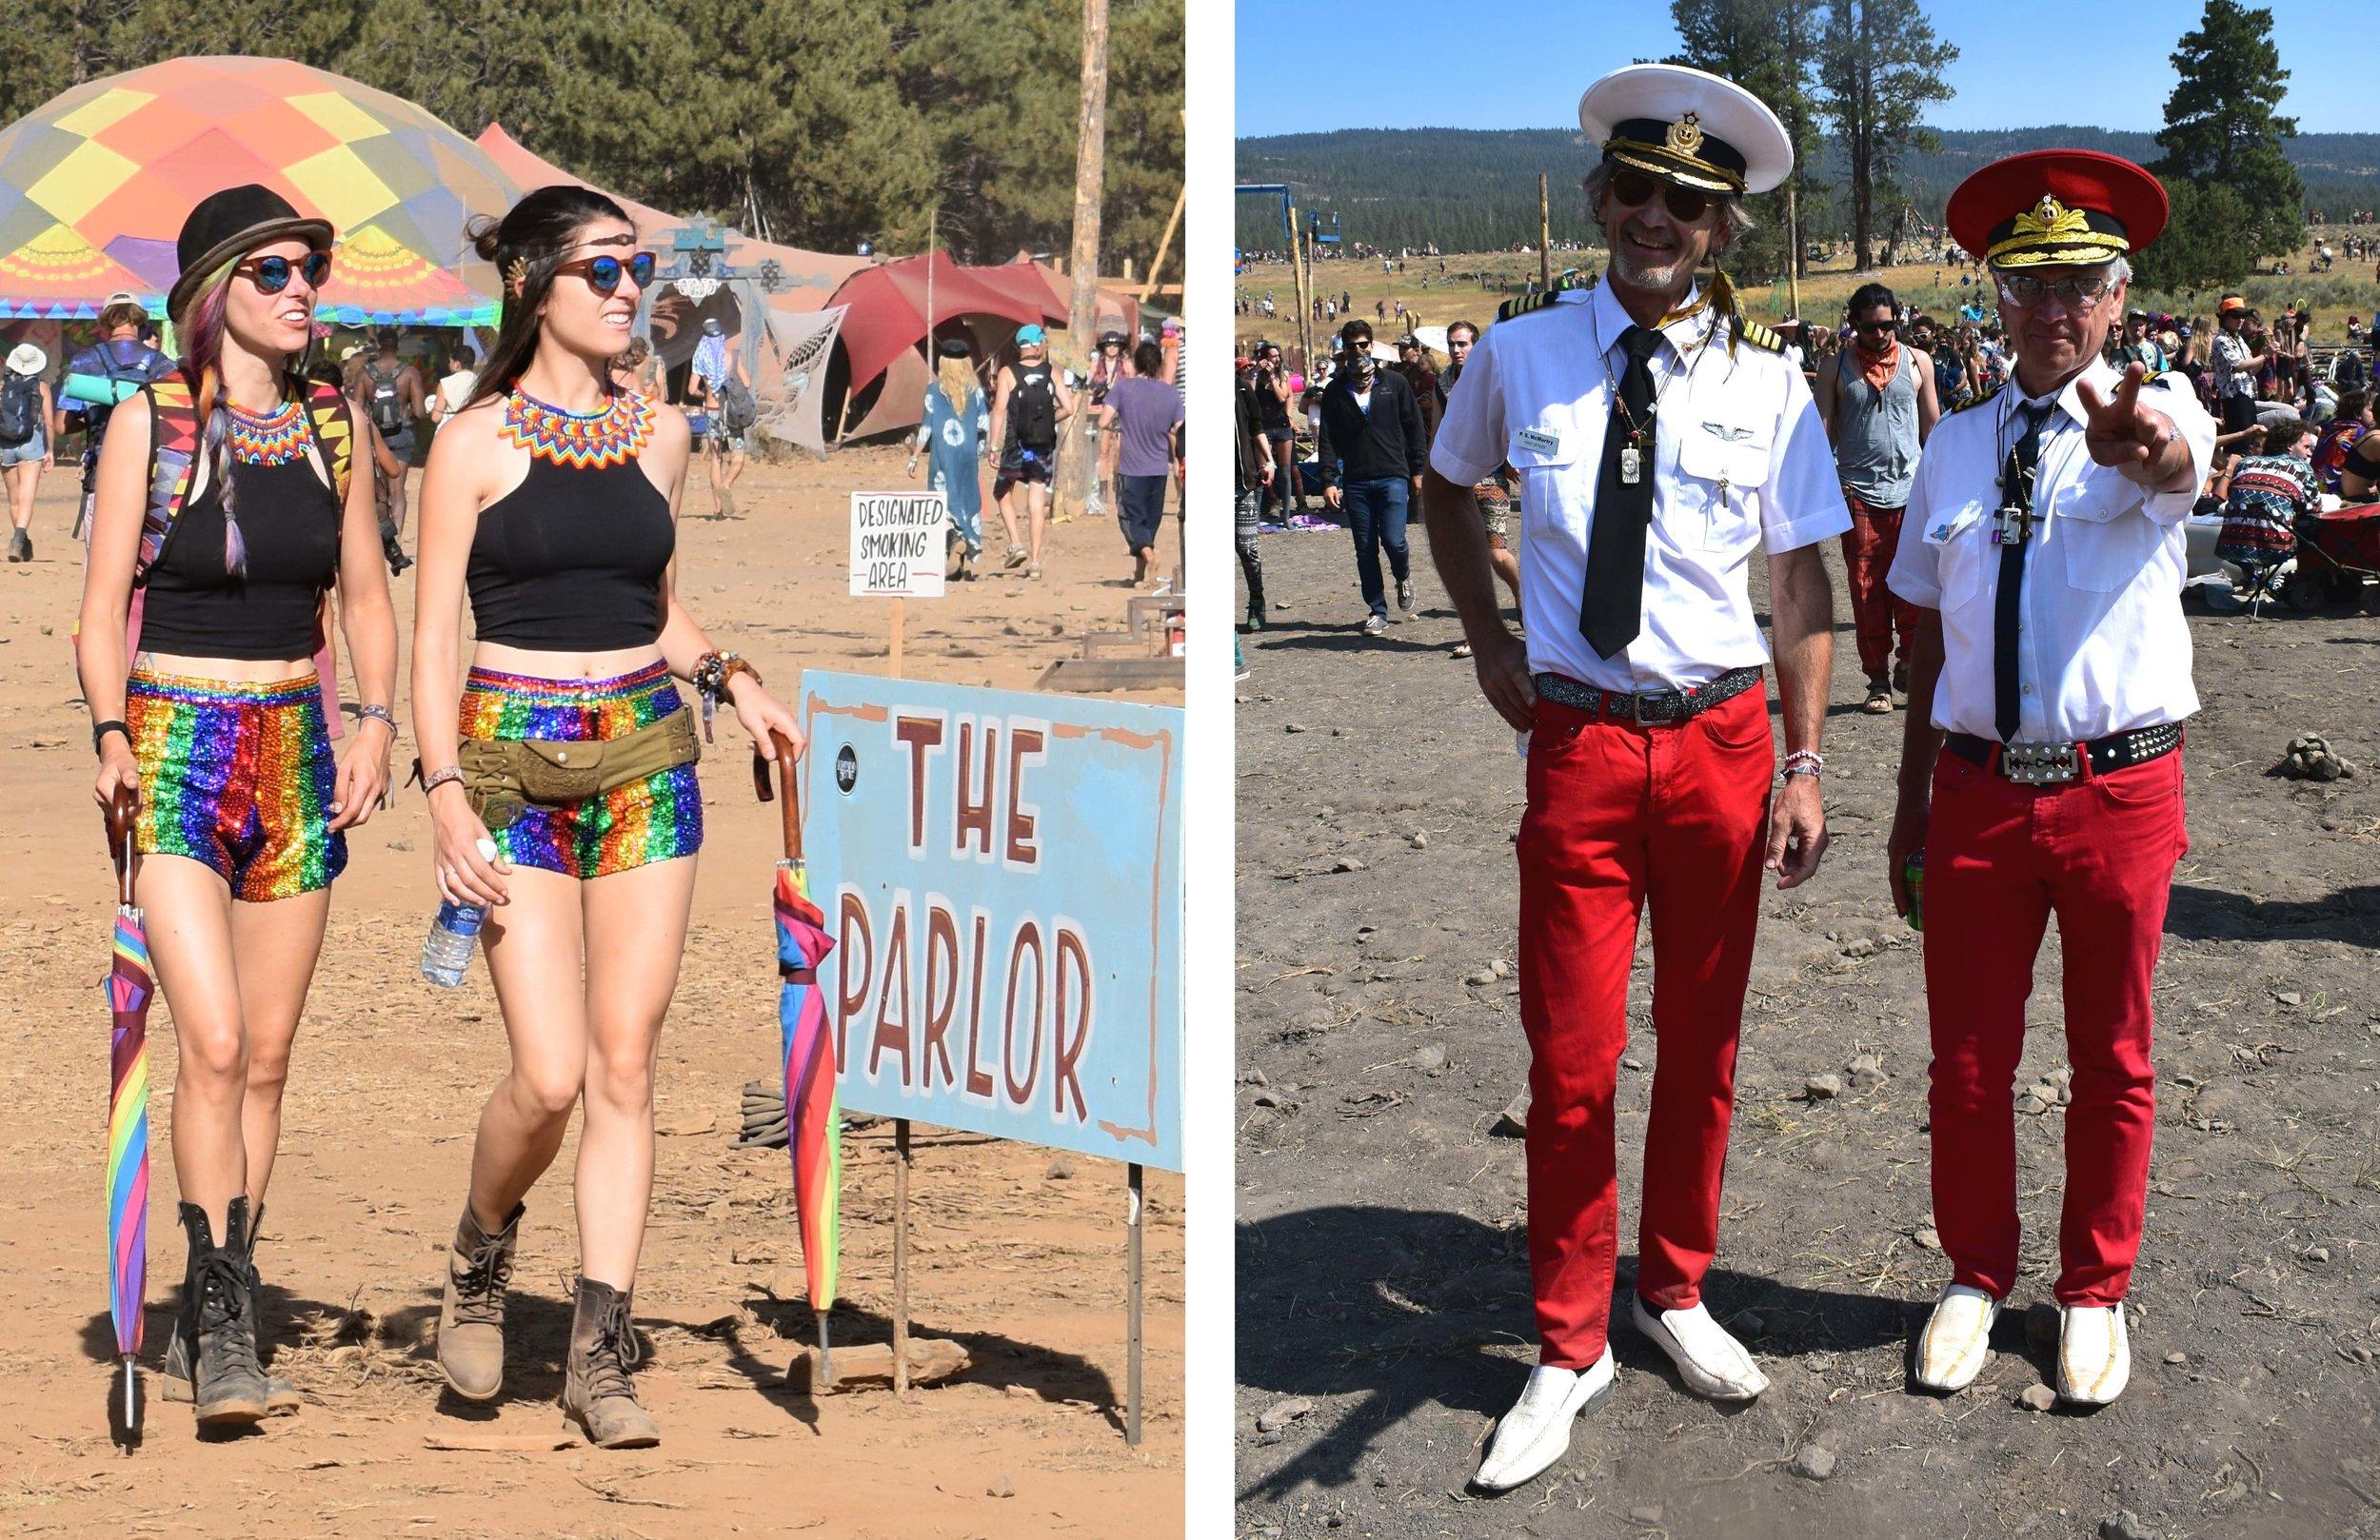 Oregon Eclipse 2017 -Symbiosis - captain hats - rainbow sparkle shorts - twinning -Envision Festival - Sonic Bloom - Rainbow Serpent - Jaded London - Chrome Monarchy - Style Guide - Florum Magazine - Hadra - Global Gathering - Lighting in a Bottle - Burning Man